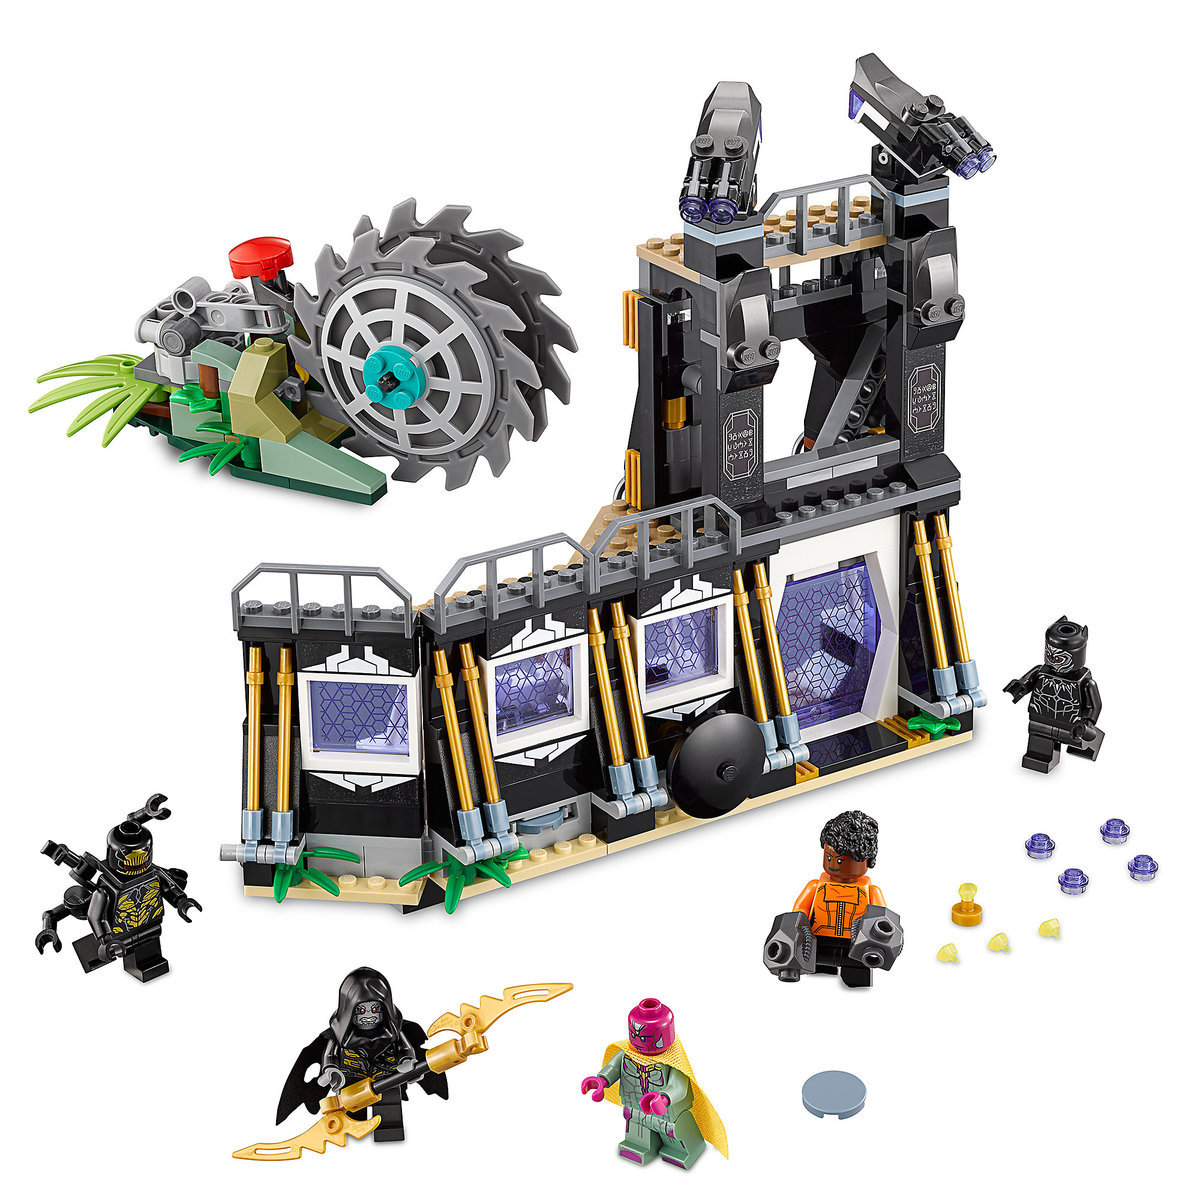 Glaive Thresher Corvus War Attack AvengersInfinity By Marvel's Playset Lego EIH9WD2